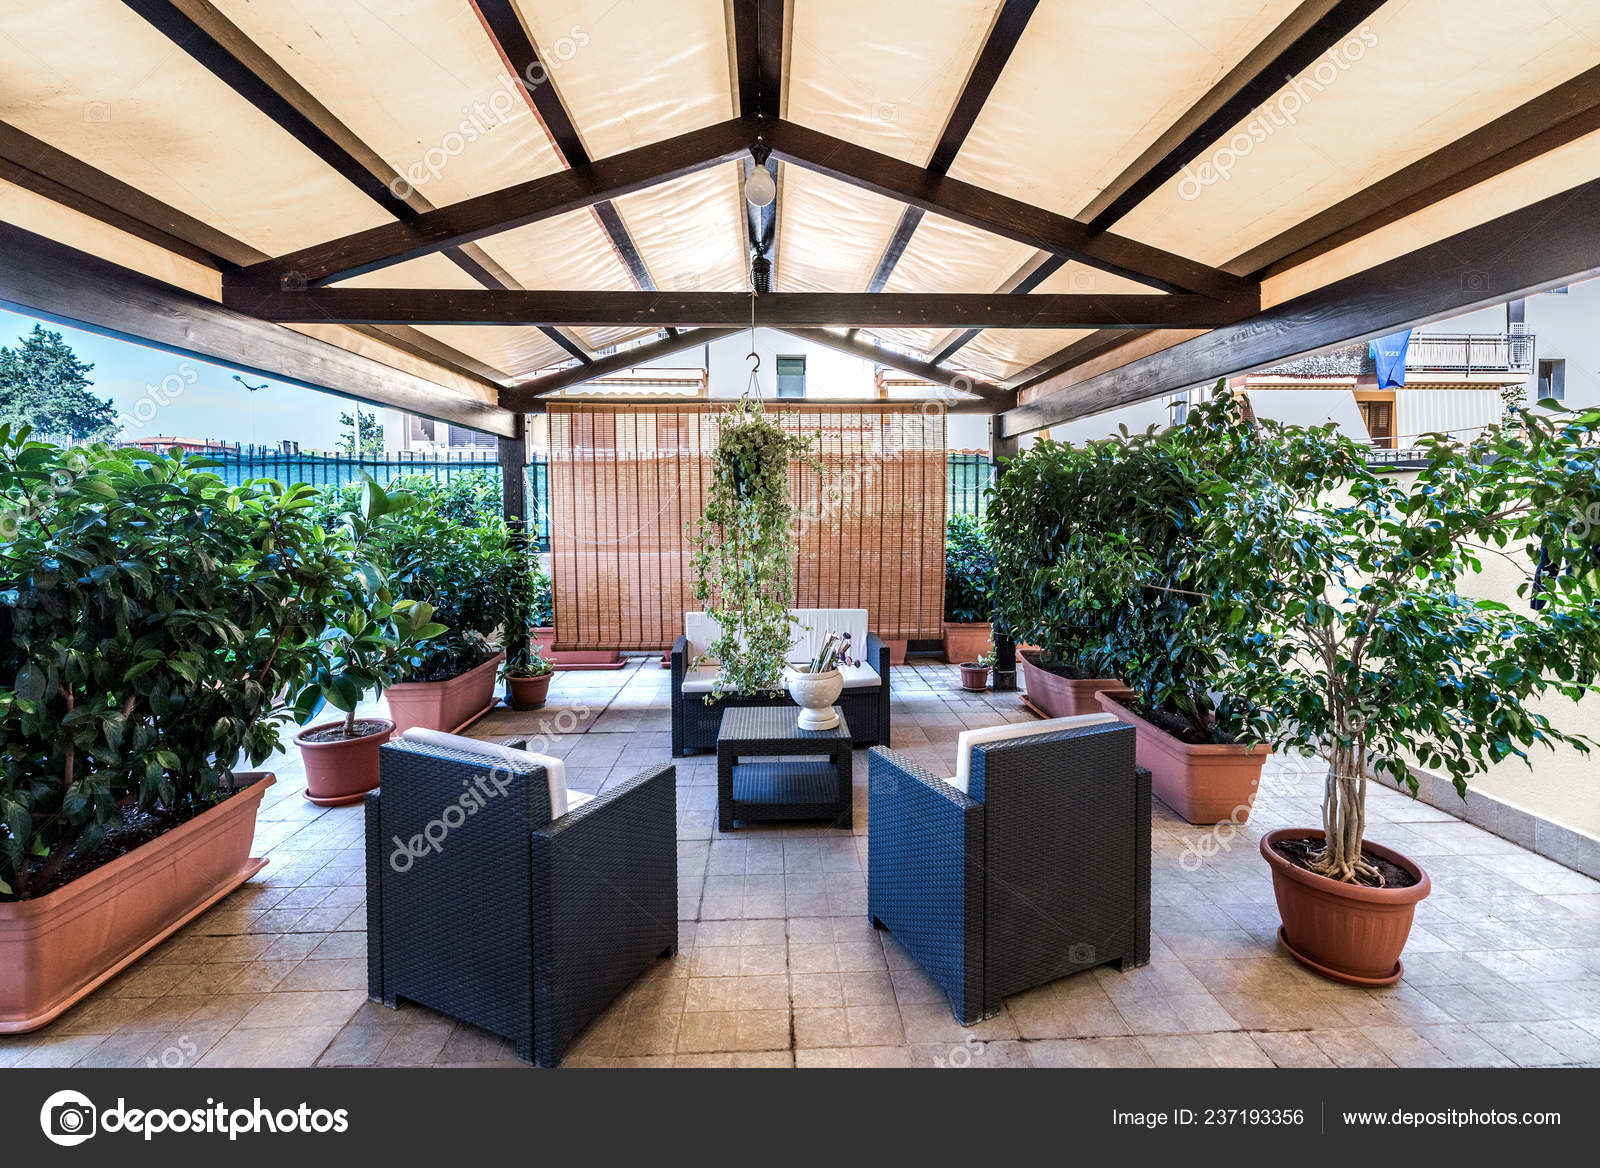 Exterior Covered Patio Furniture Plantes Image Stock Editorial Photo C Micheleponzio 237193356